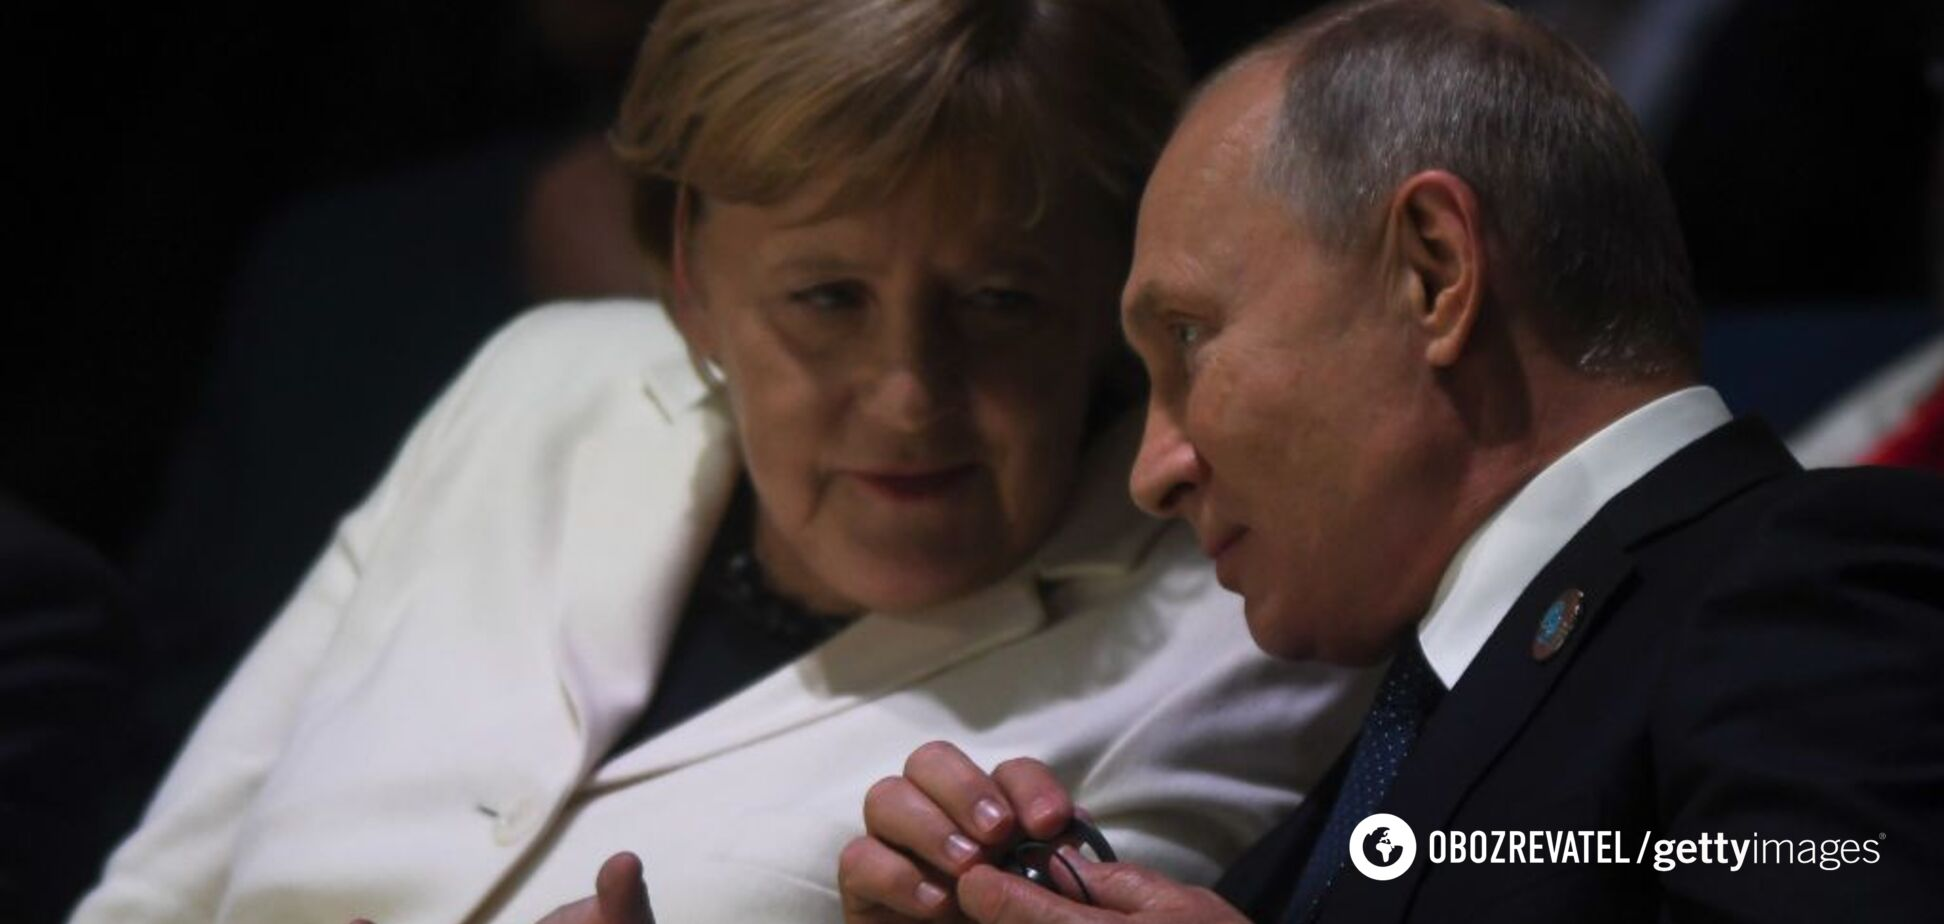 'Германия, ты одурела!'